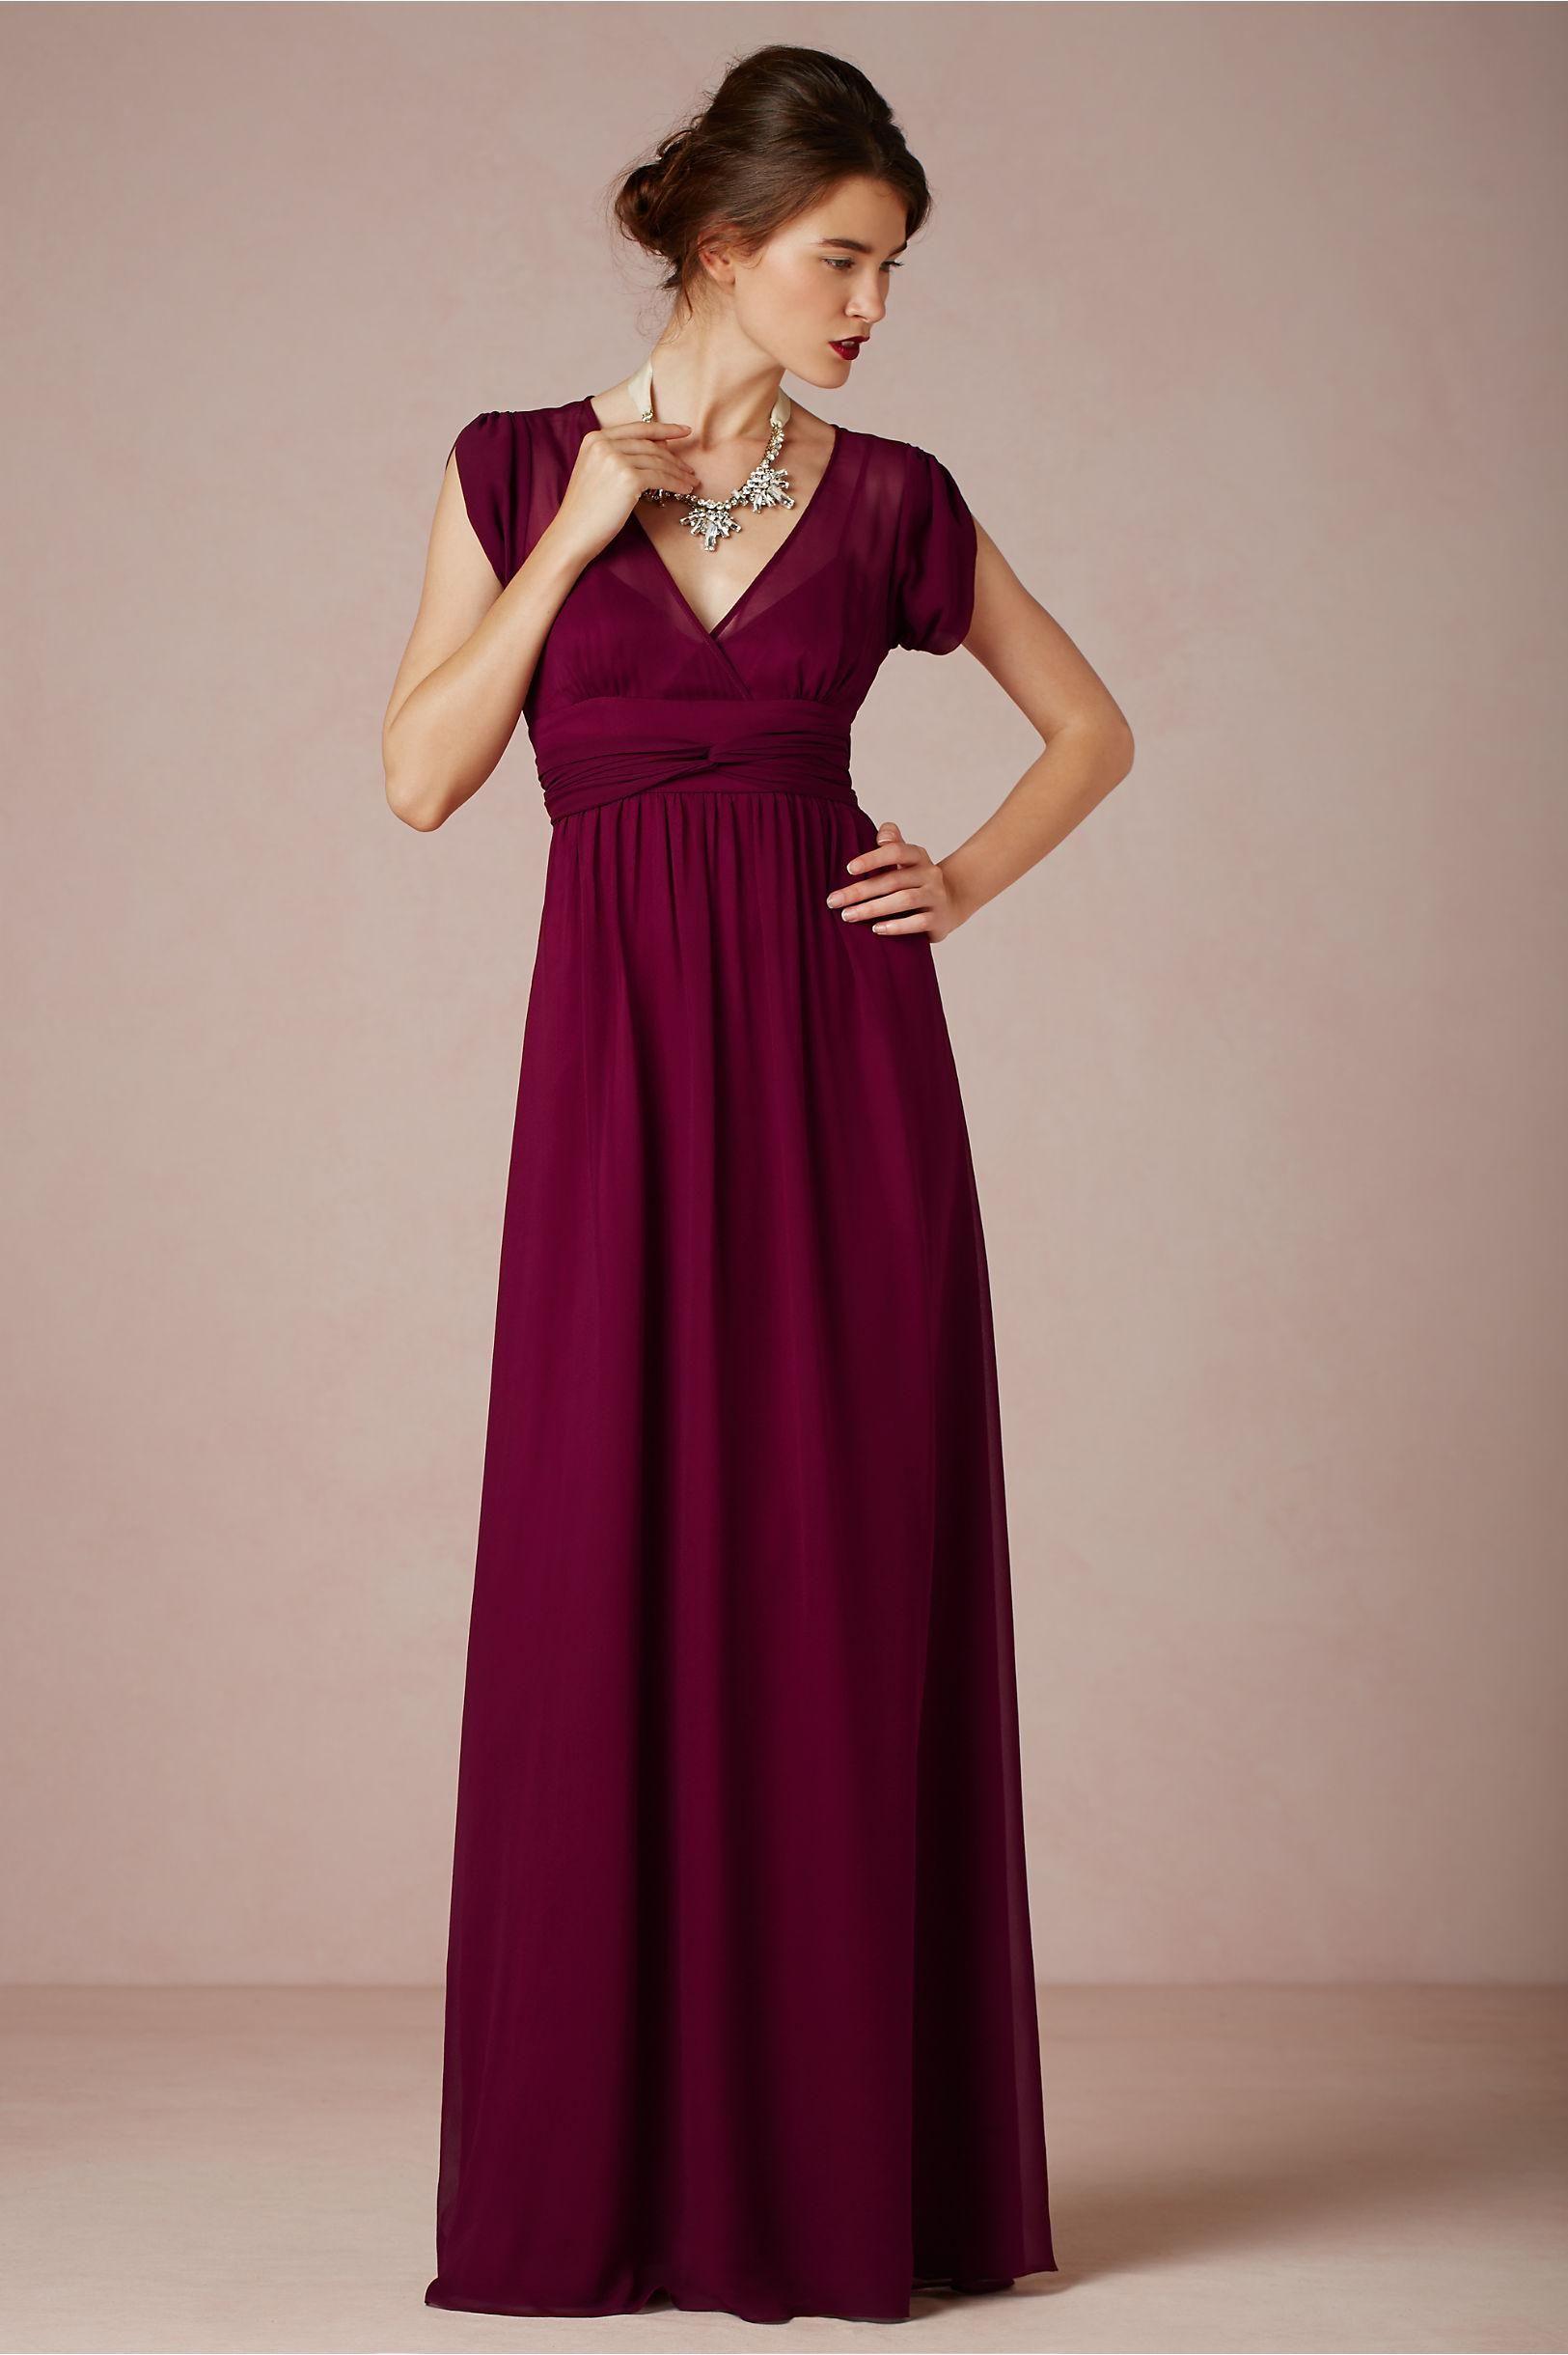 21c80c43bc Ava Maxi Dress in Merlot from BHLDN | Red Wedding Ideas | Bridesmaid ...